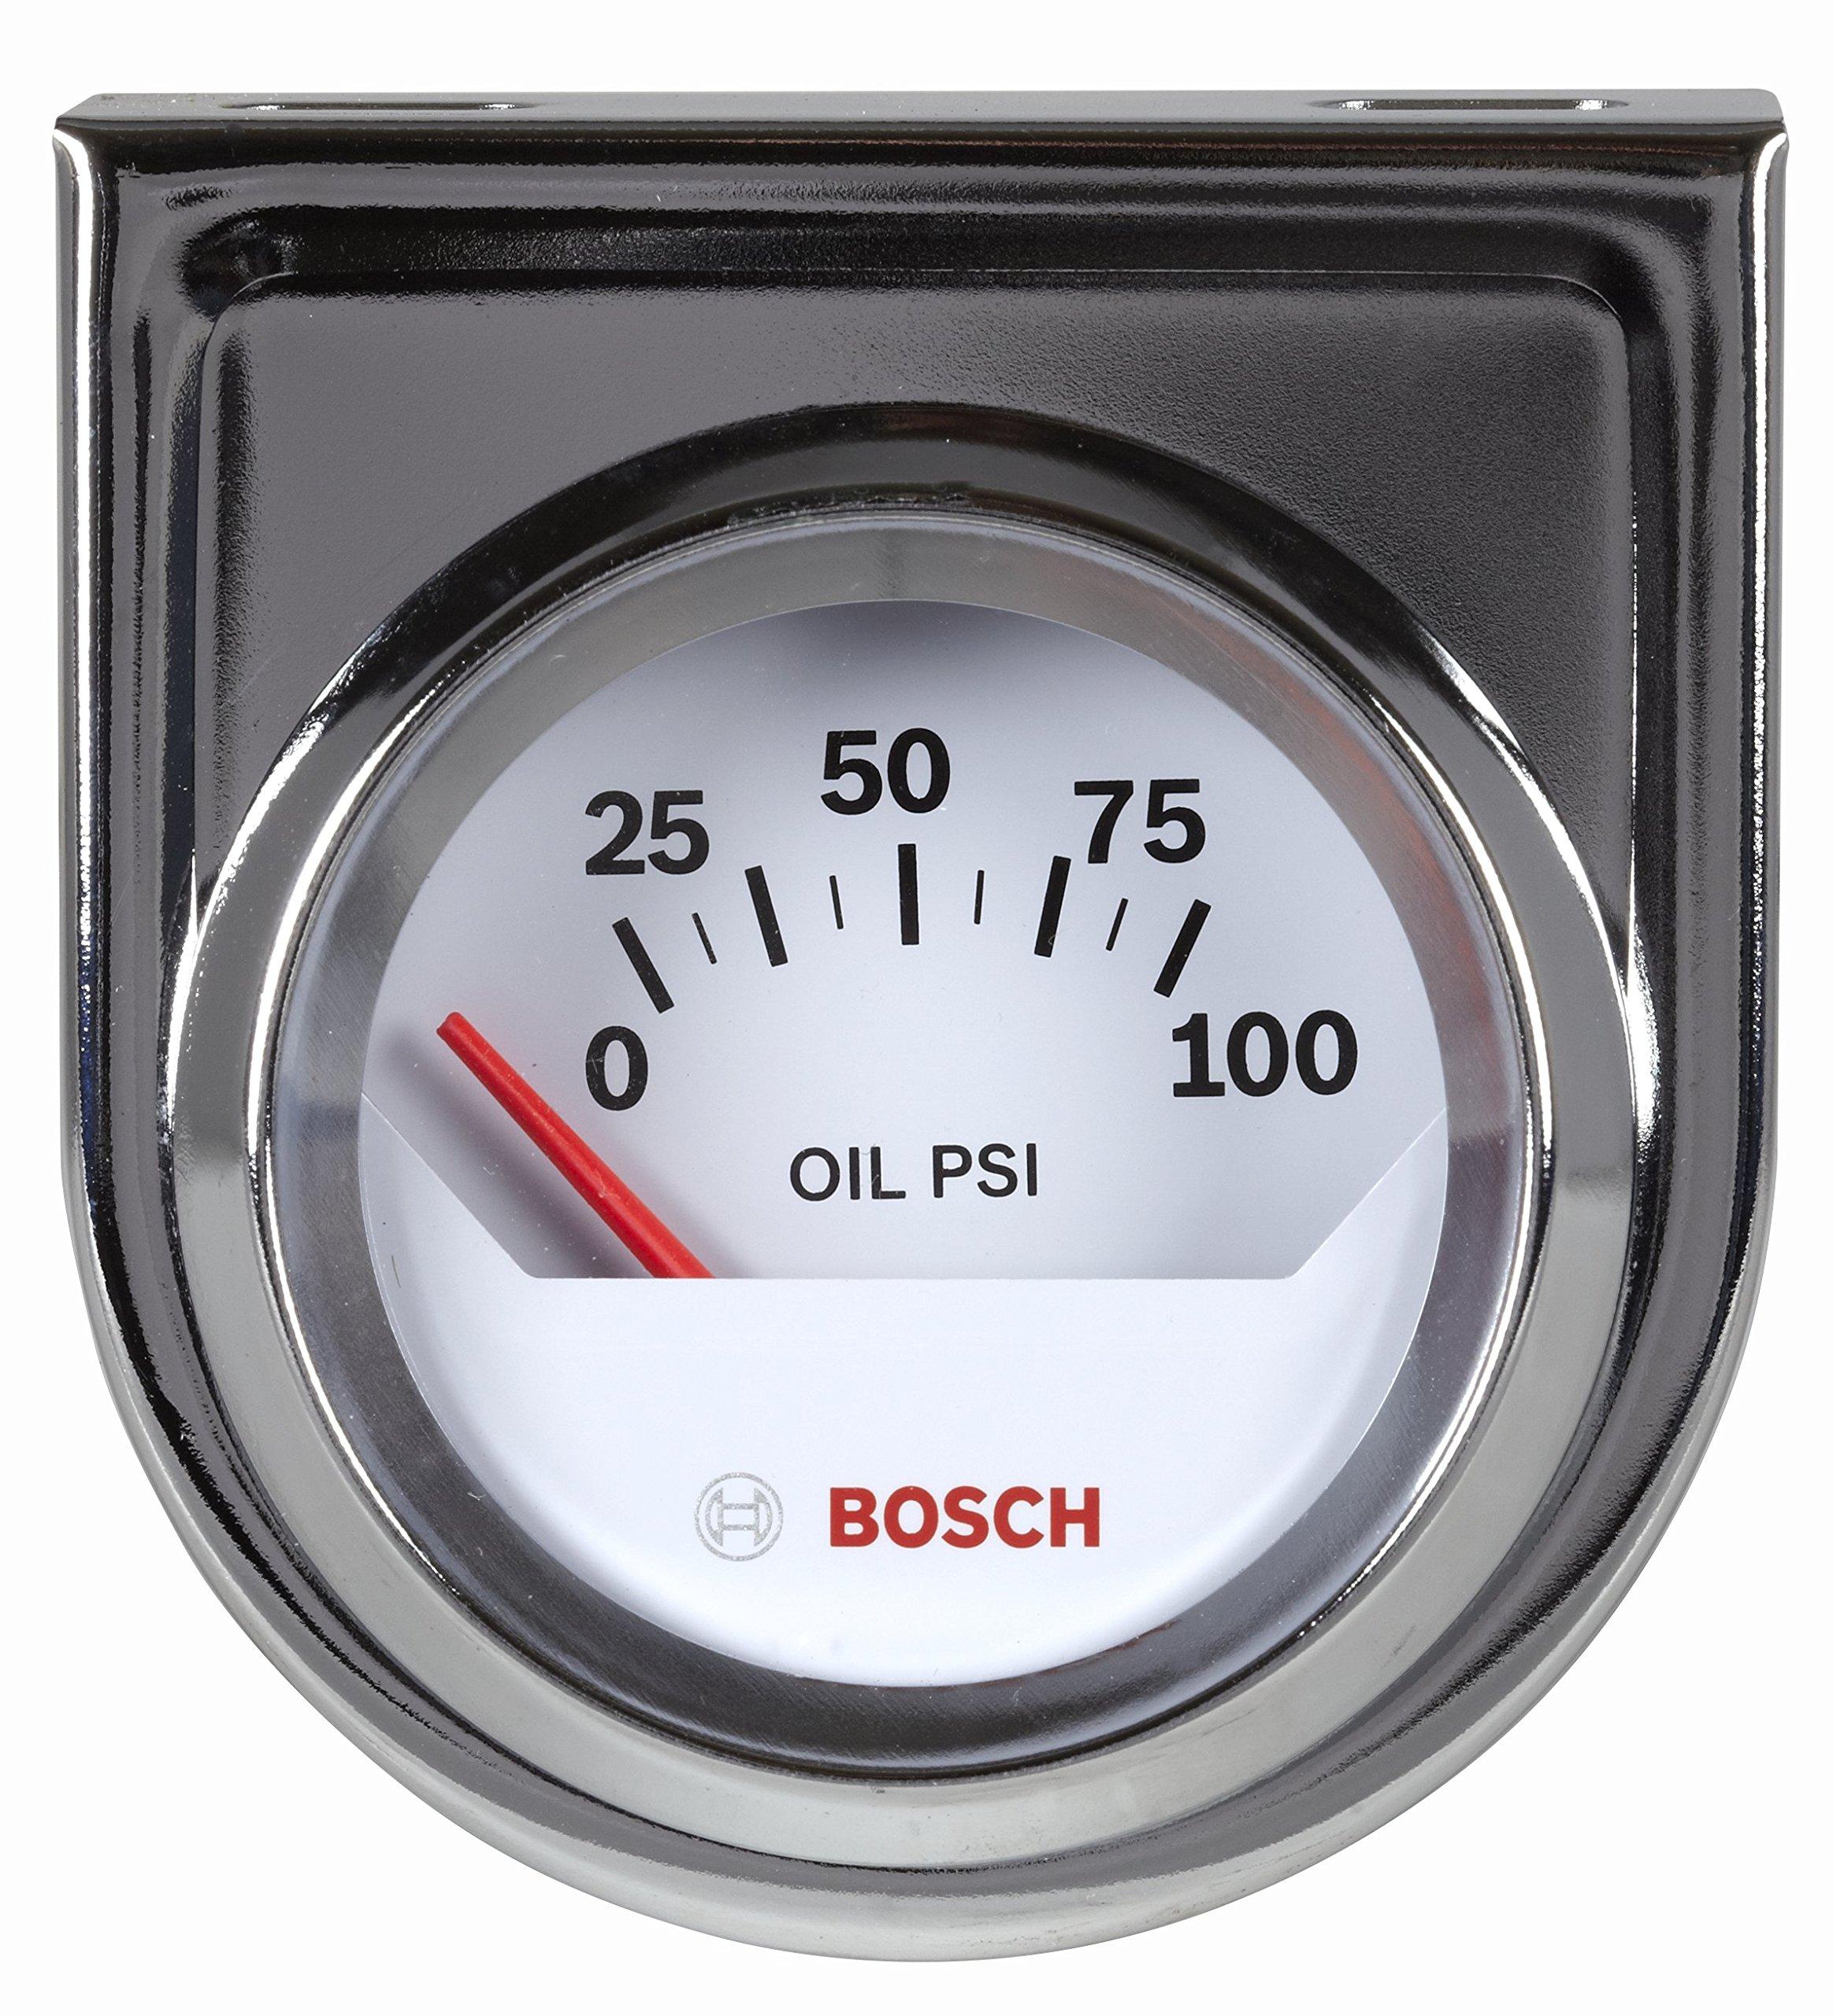 Bosch SP0F000041 Style Line 2'' Electrical Oil Pressure Gauge (White Dial Face, Chrome Bezel) by Bosch Automotive